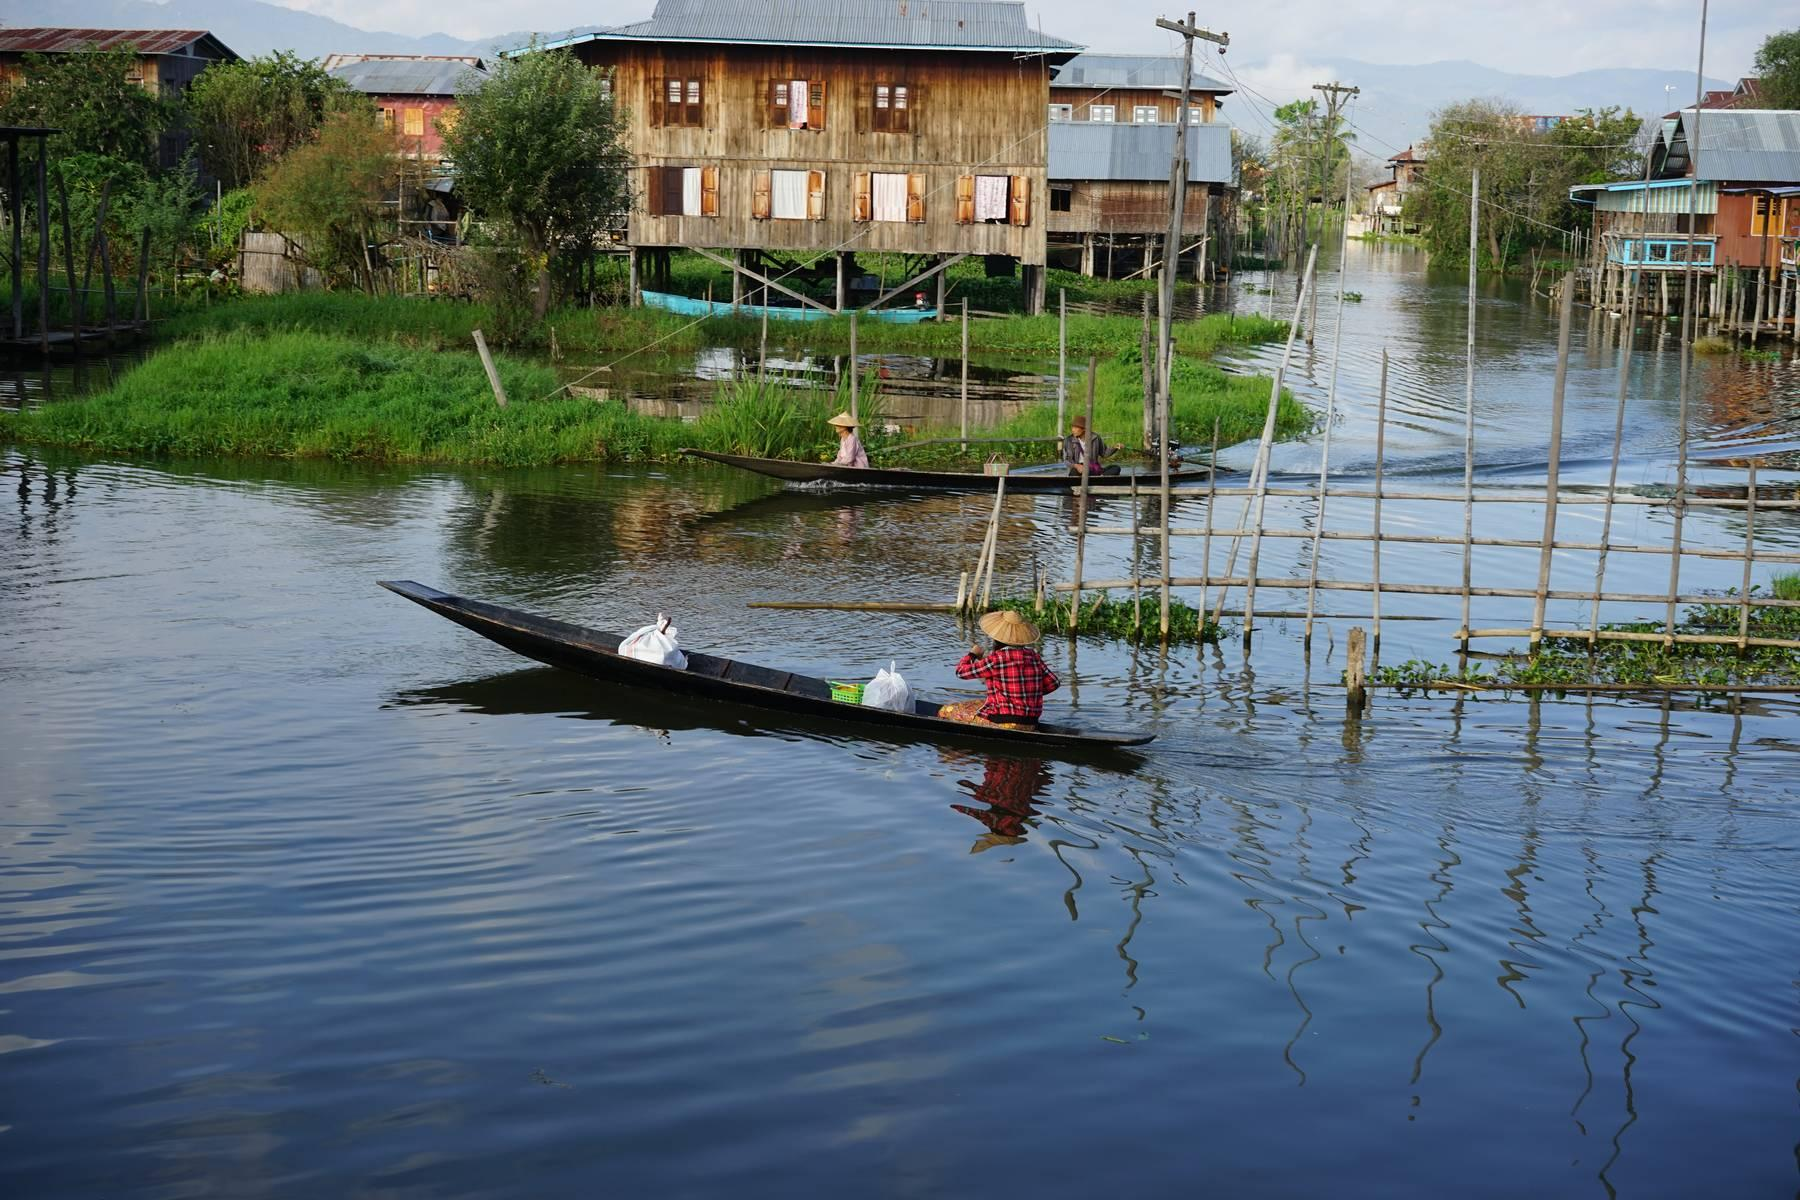 Voyage solidaire Birmanie : Vision du Monde - Photo 4